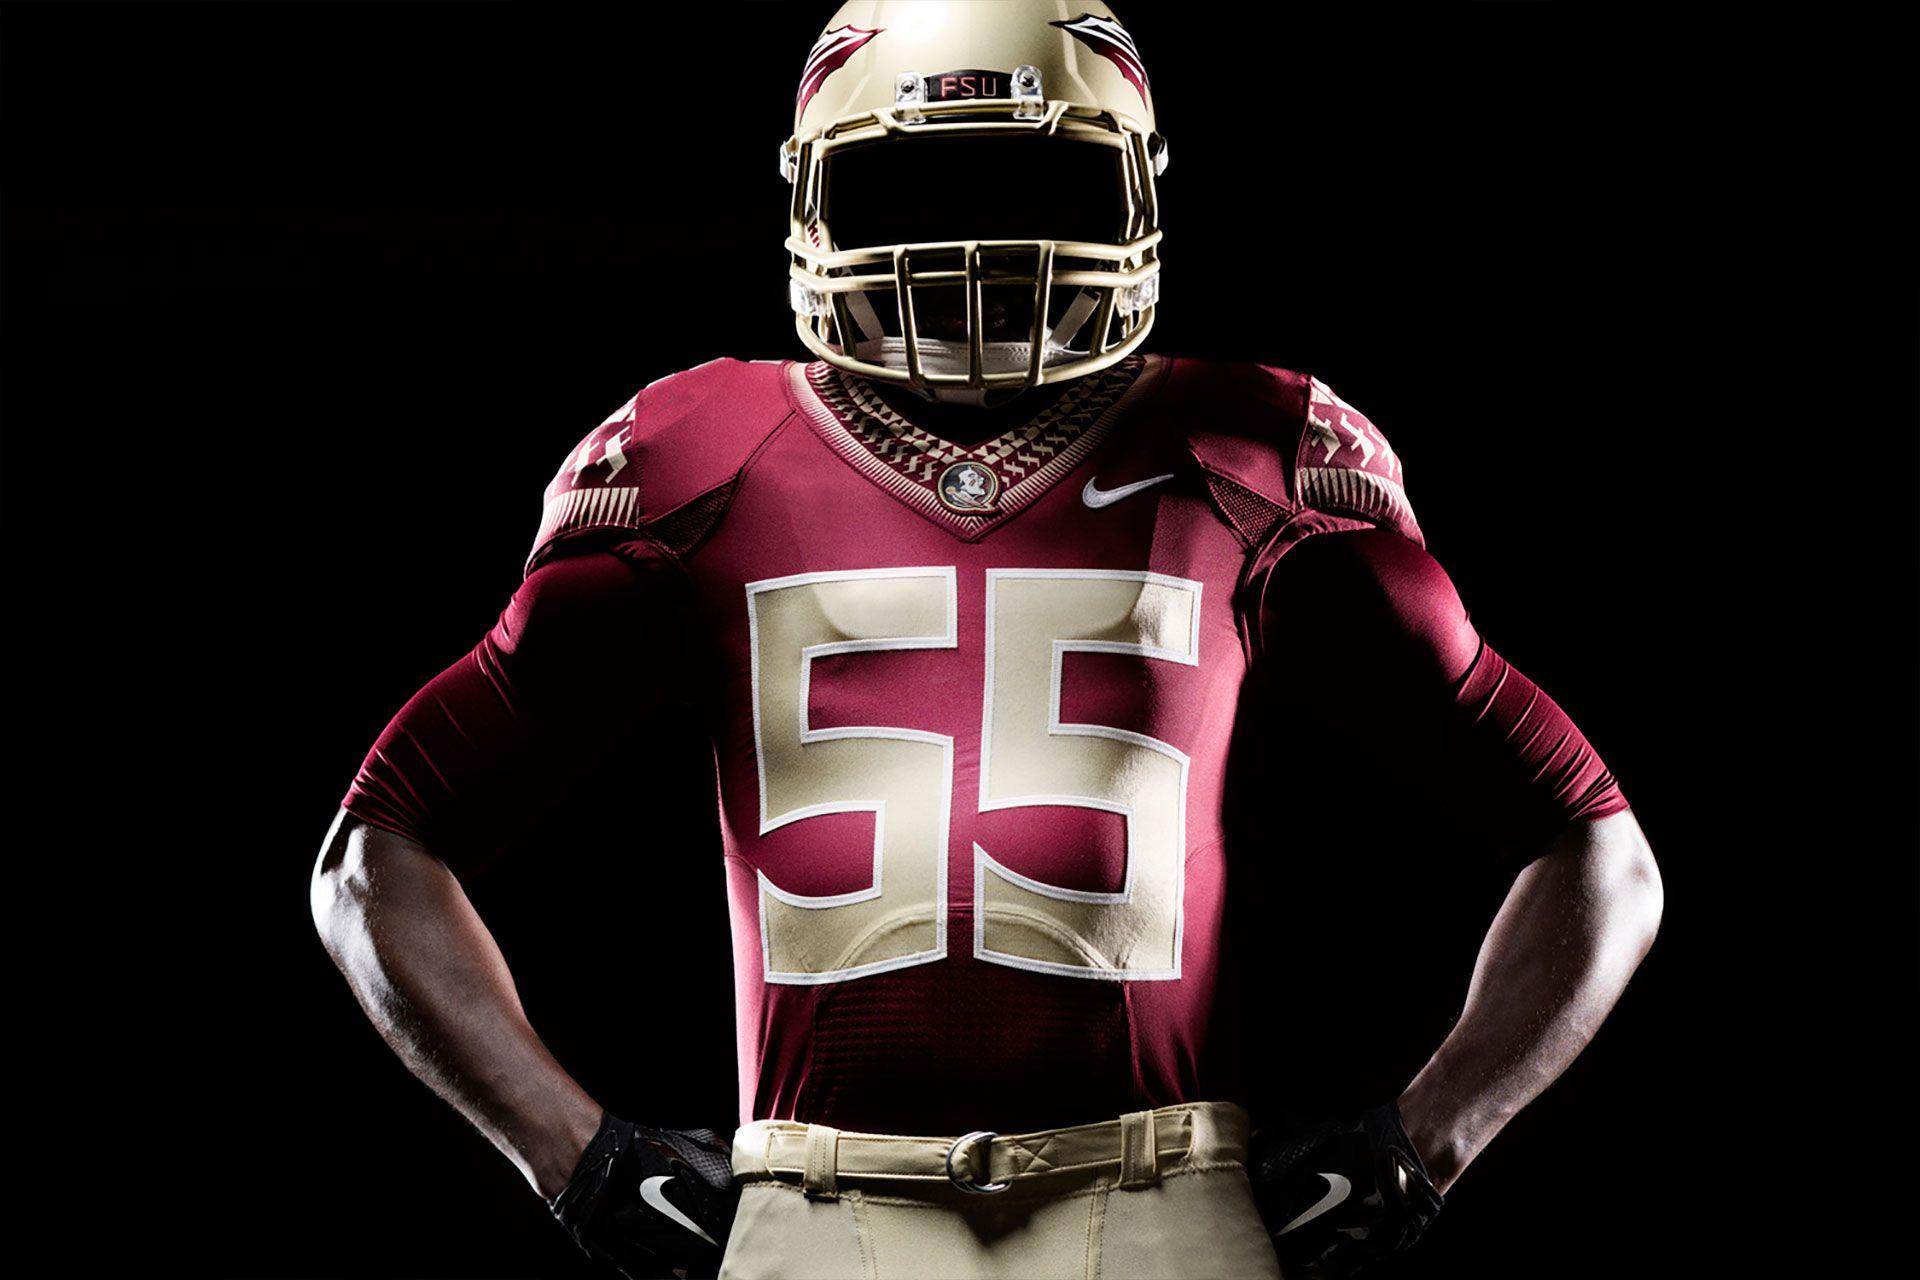 Ignitiontradition Football Uniform Design Football Uniforms Florida State Seminoles Seminole